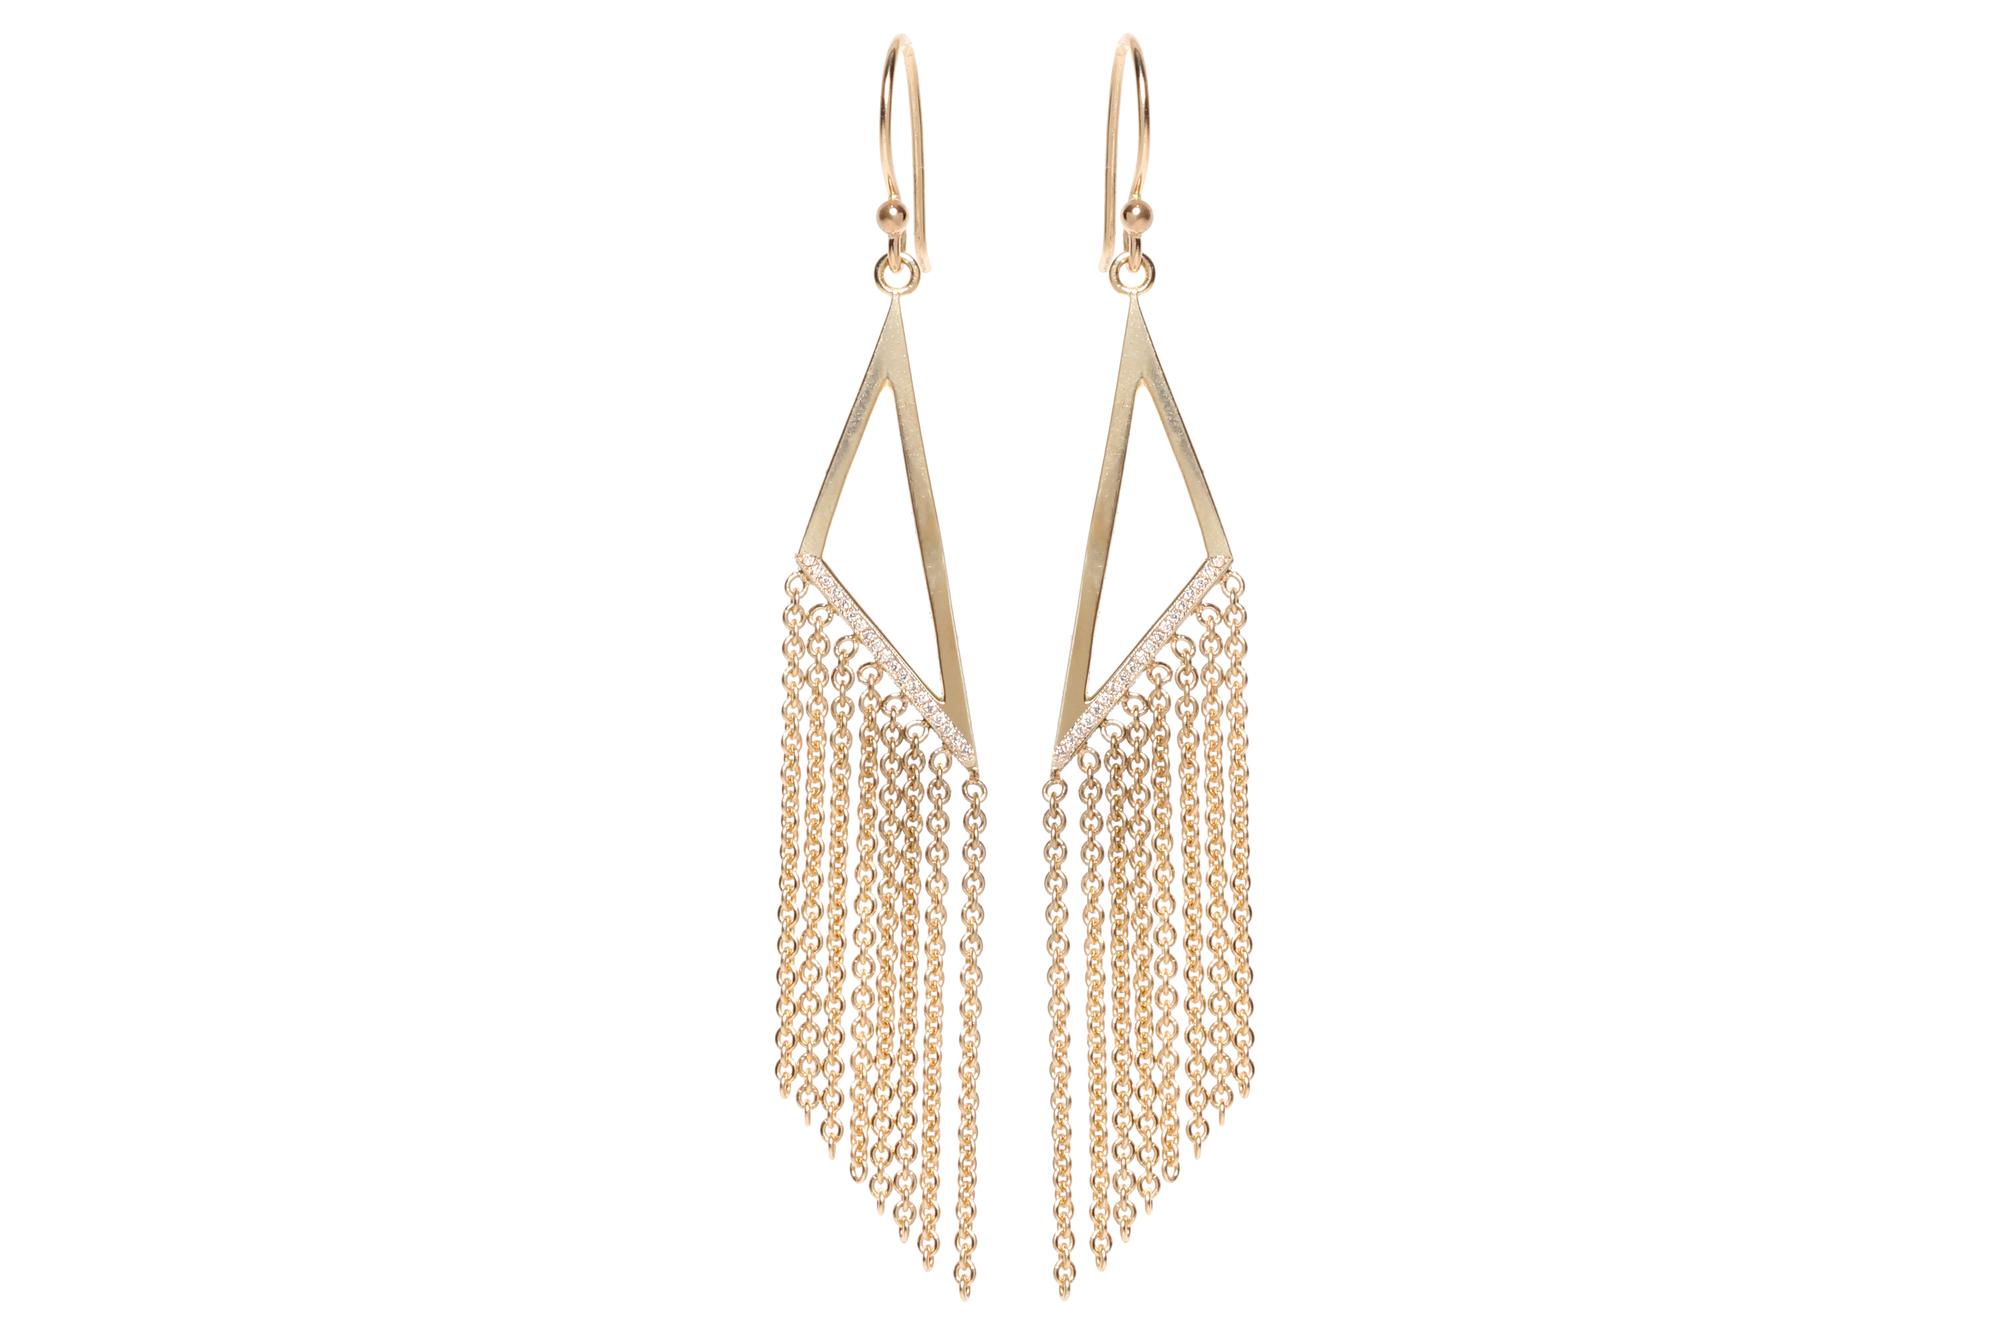 The Jewel - Zoe Chicco - Lookbook - Gold Triangle Chain Earrings